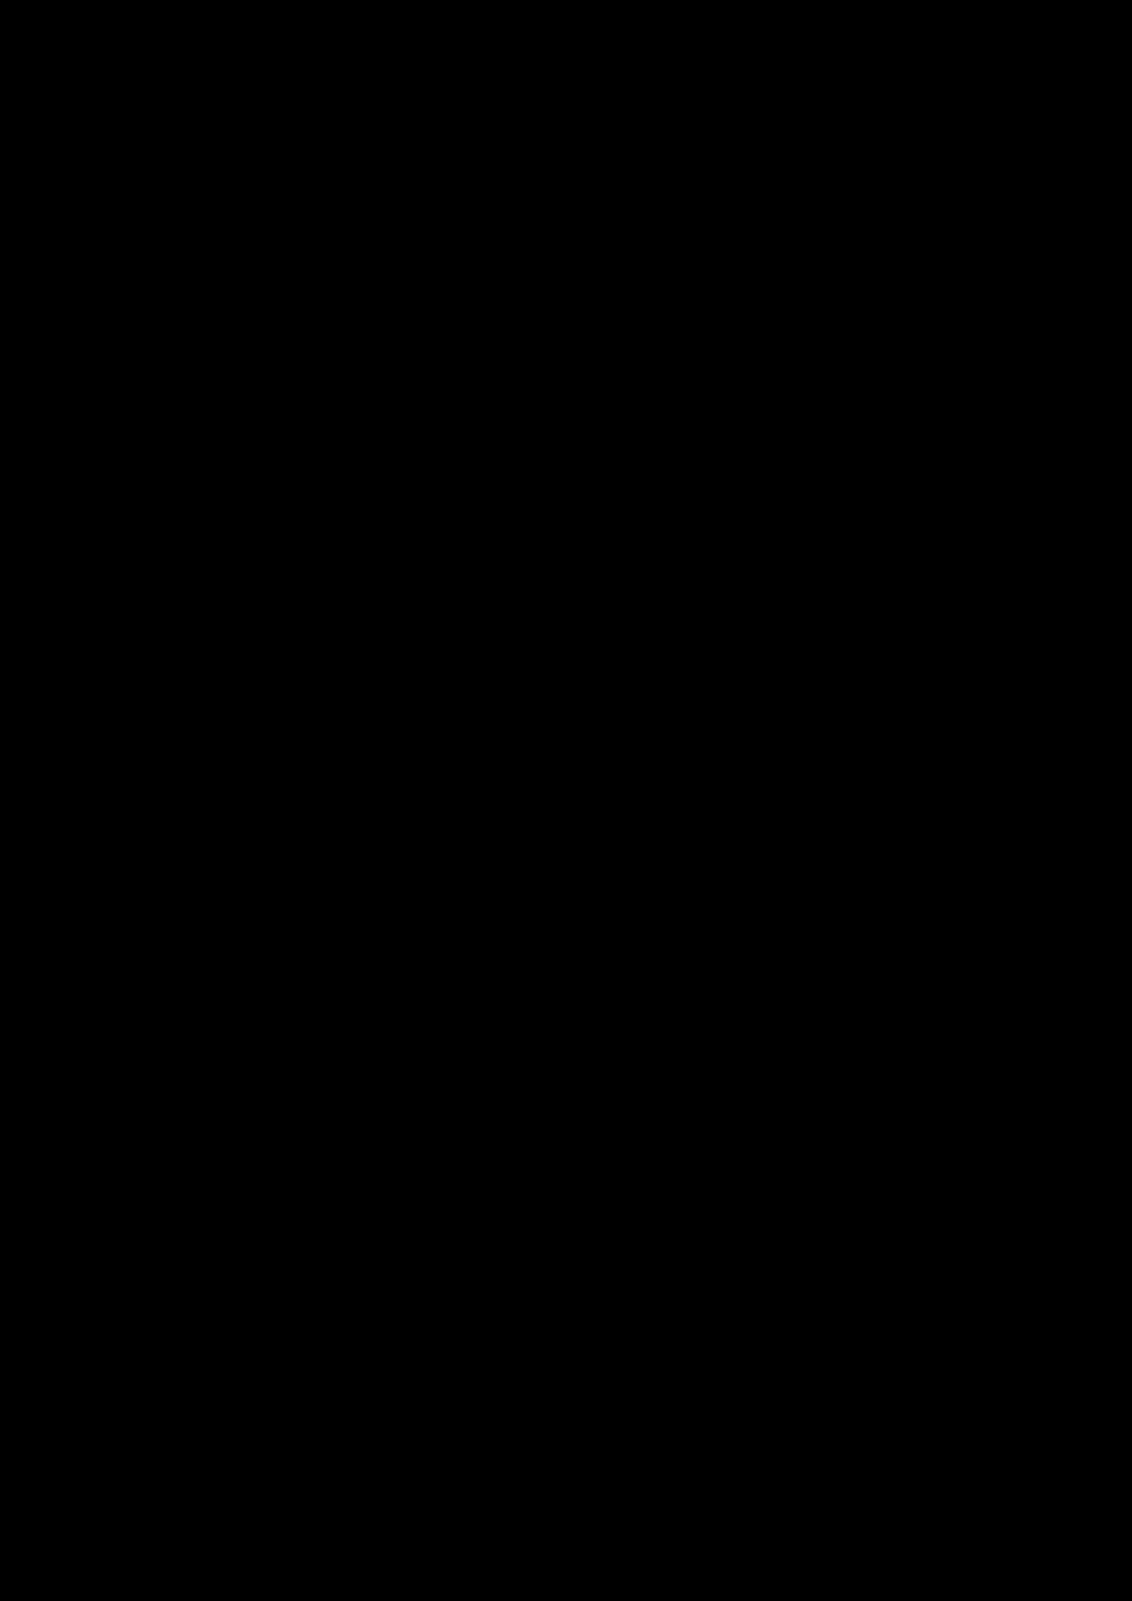 Ispoved Pervogo Boga slide, Image 77